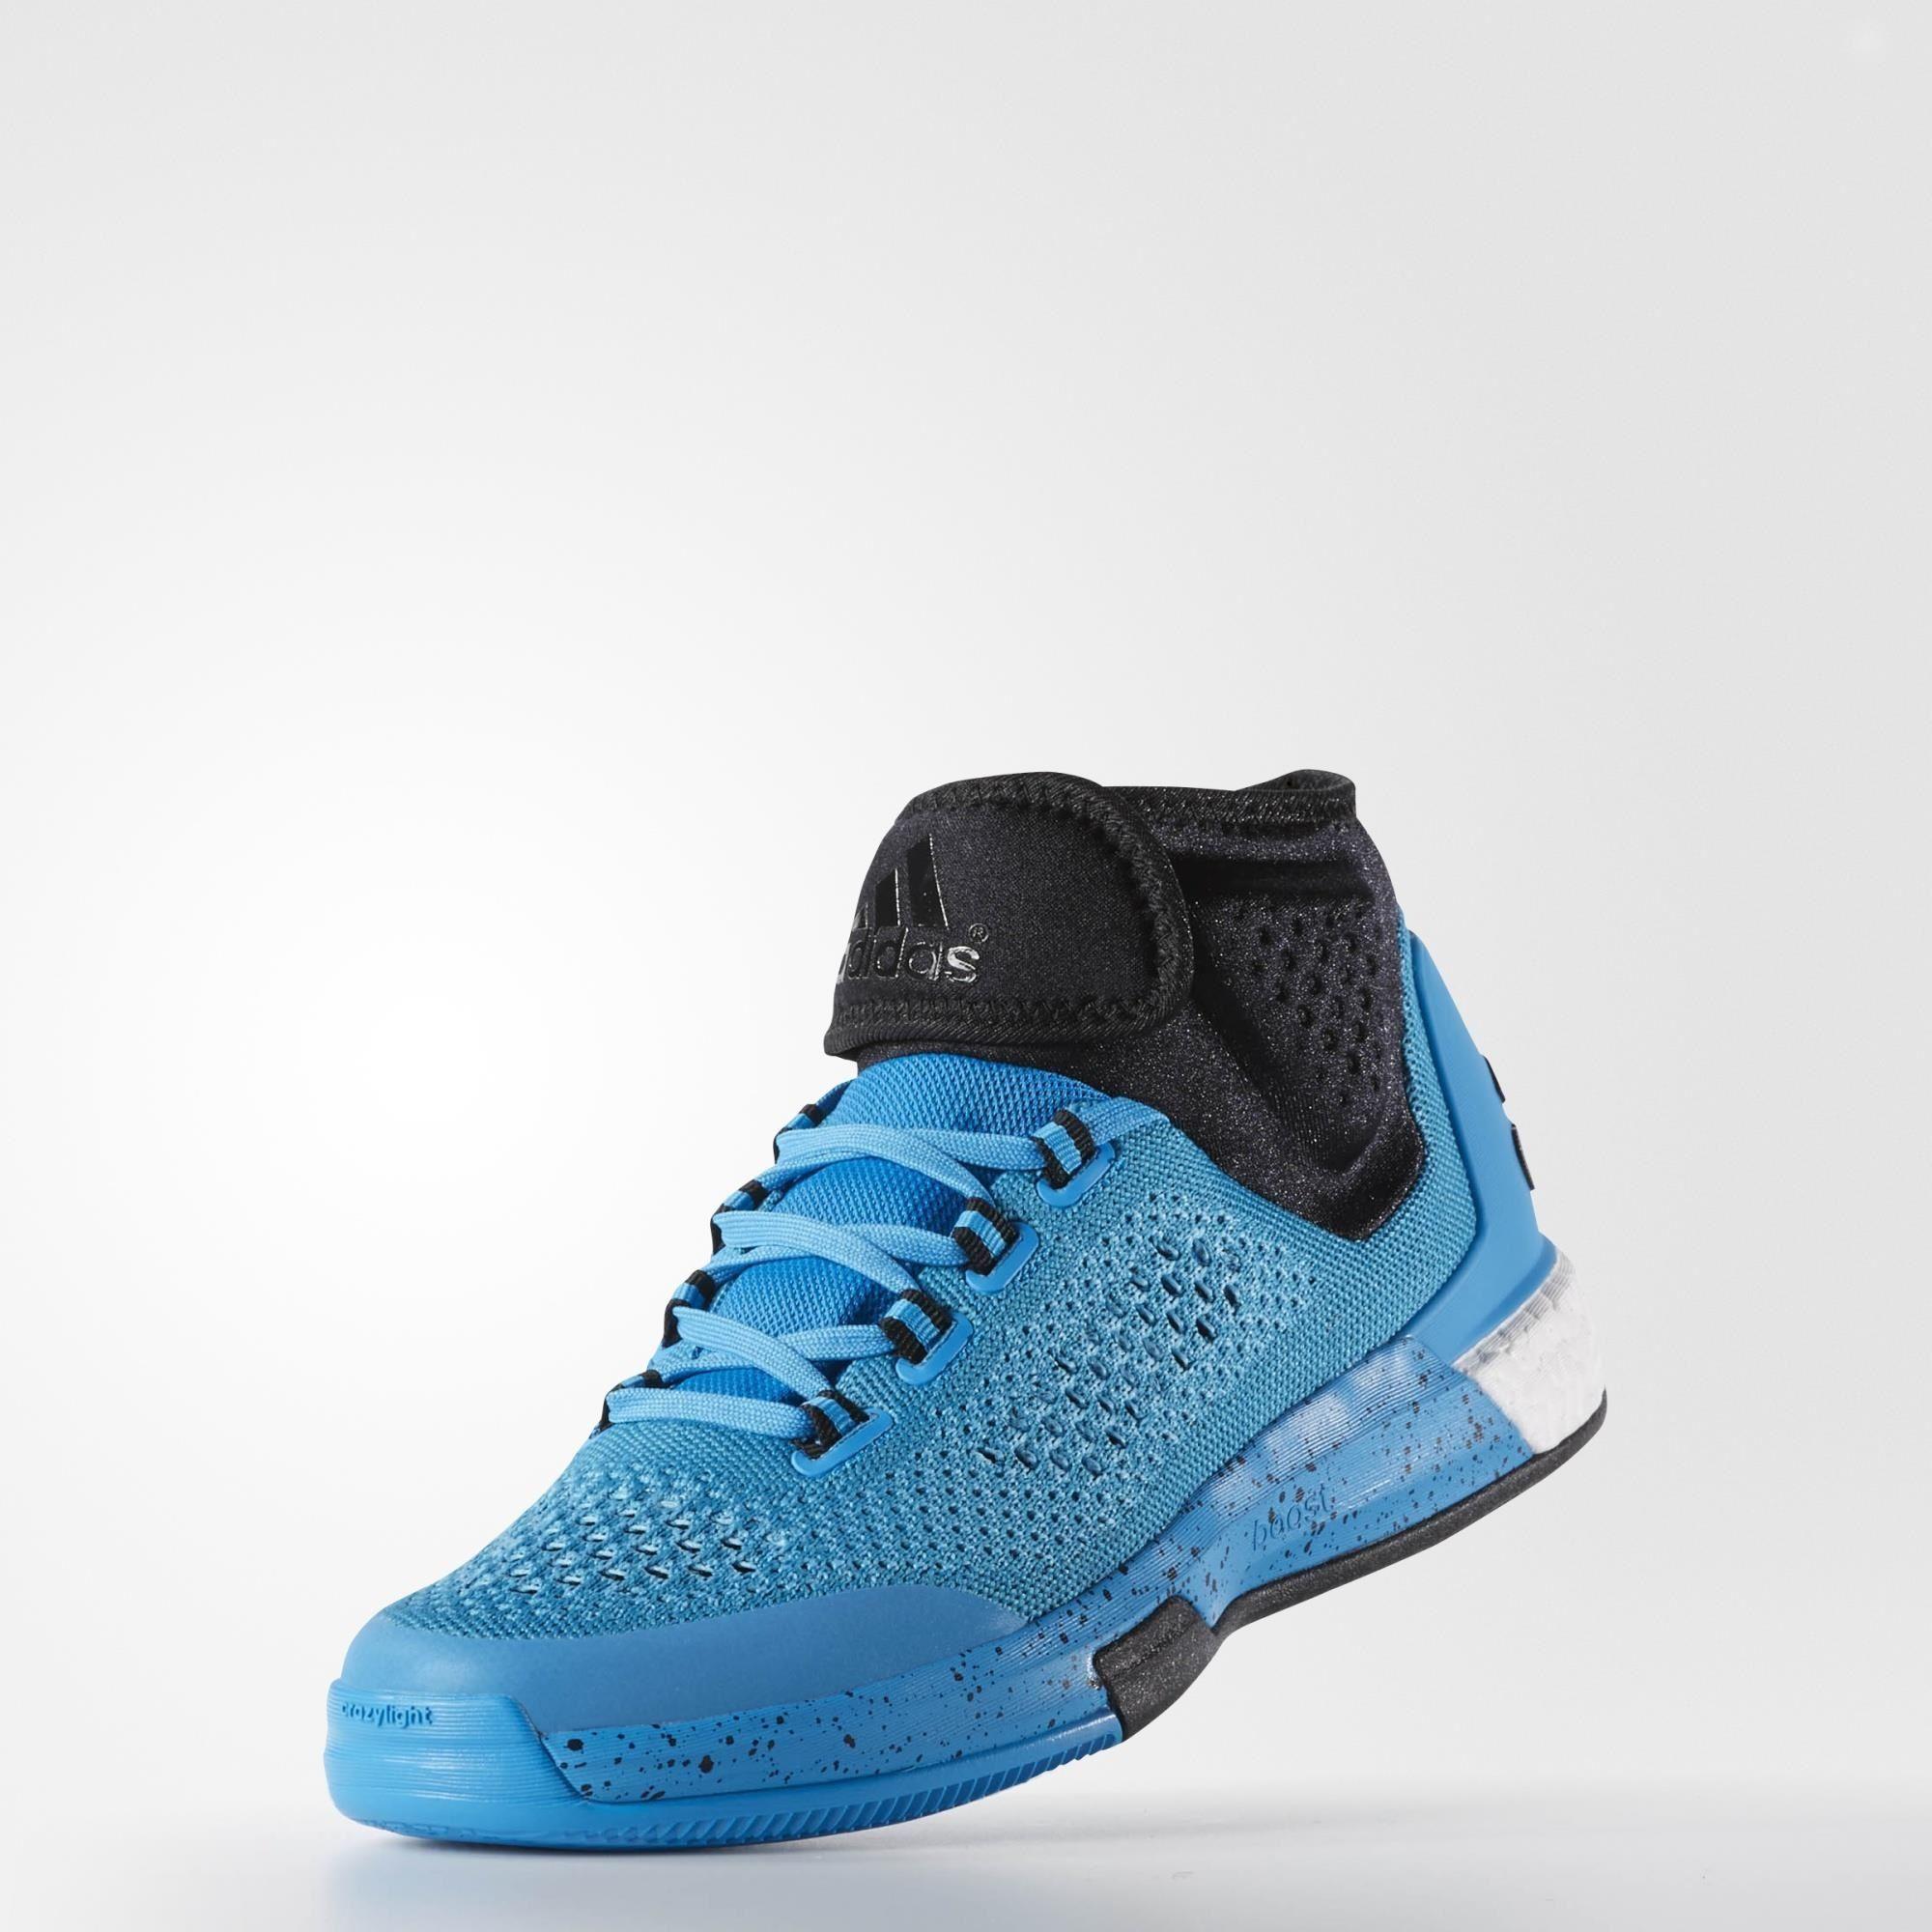 53d146343929 adidas 2015 Crazylight Boost Primeknit Shoes - Blue